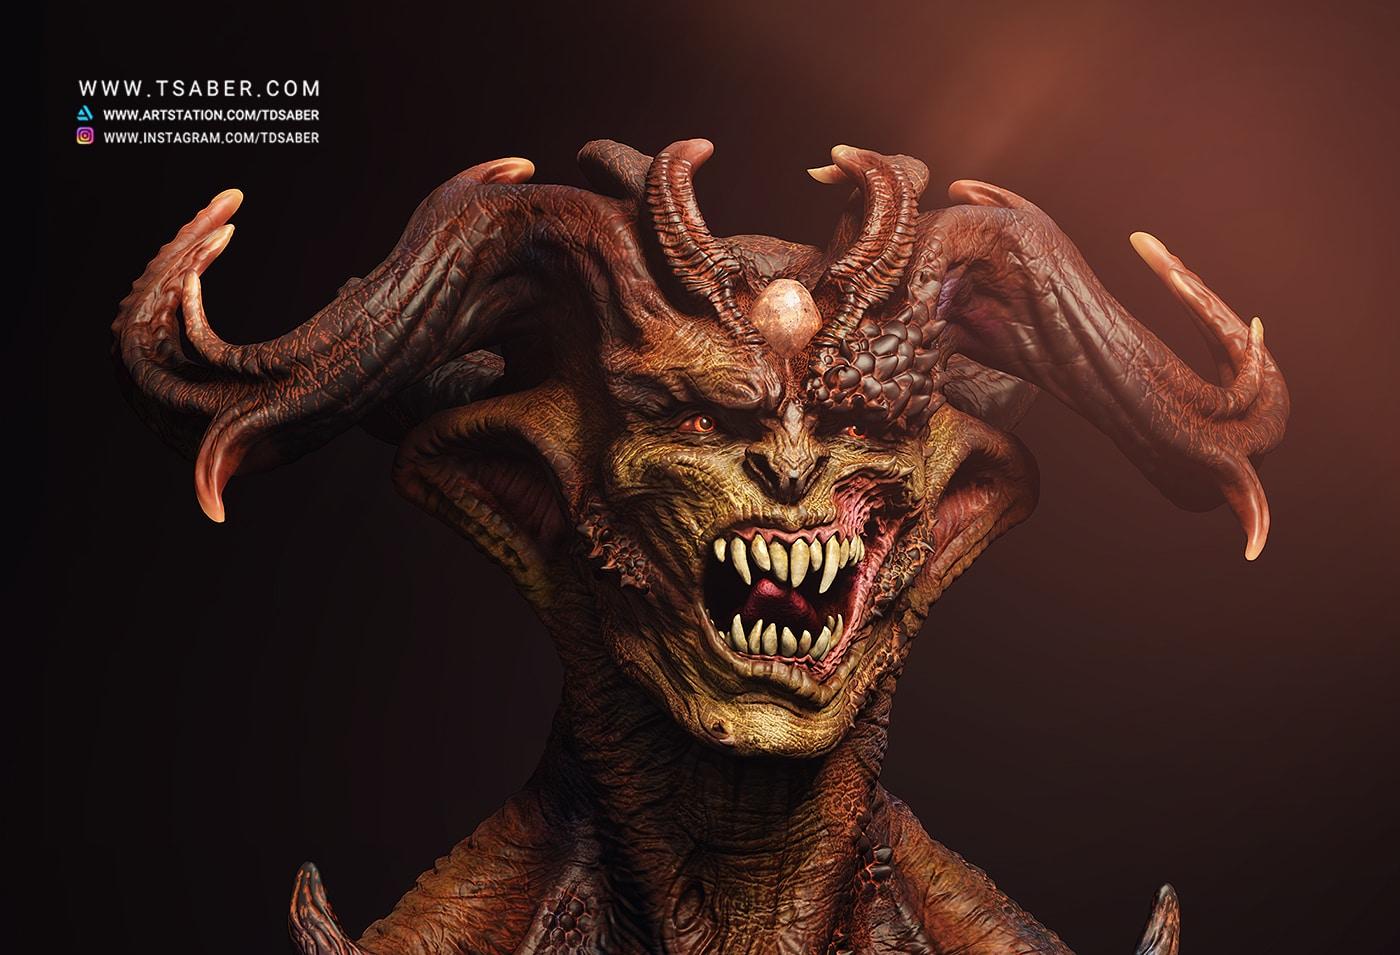 Demon Portrait Zbrush - Tsaber